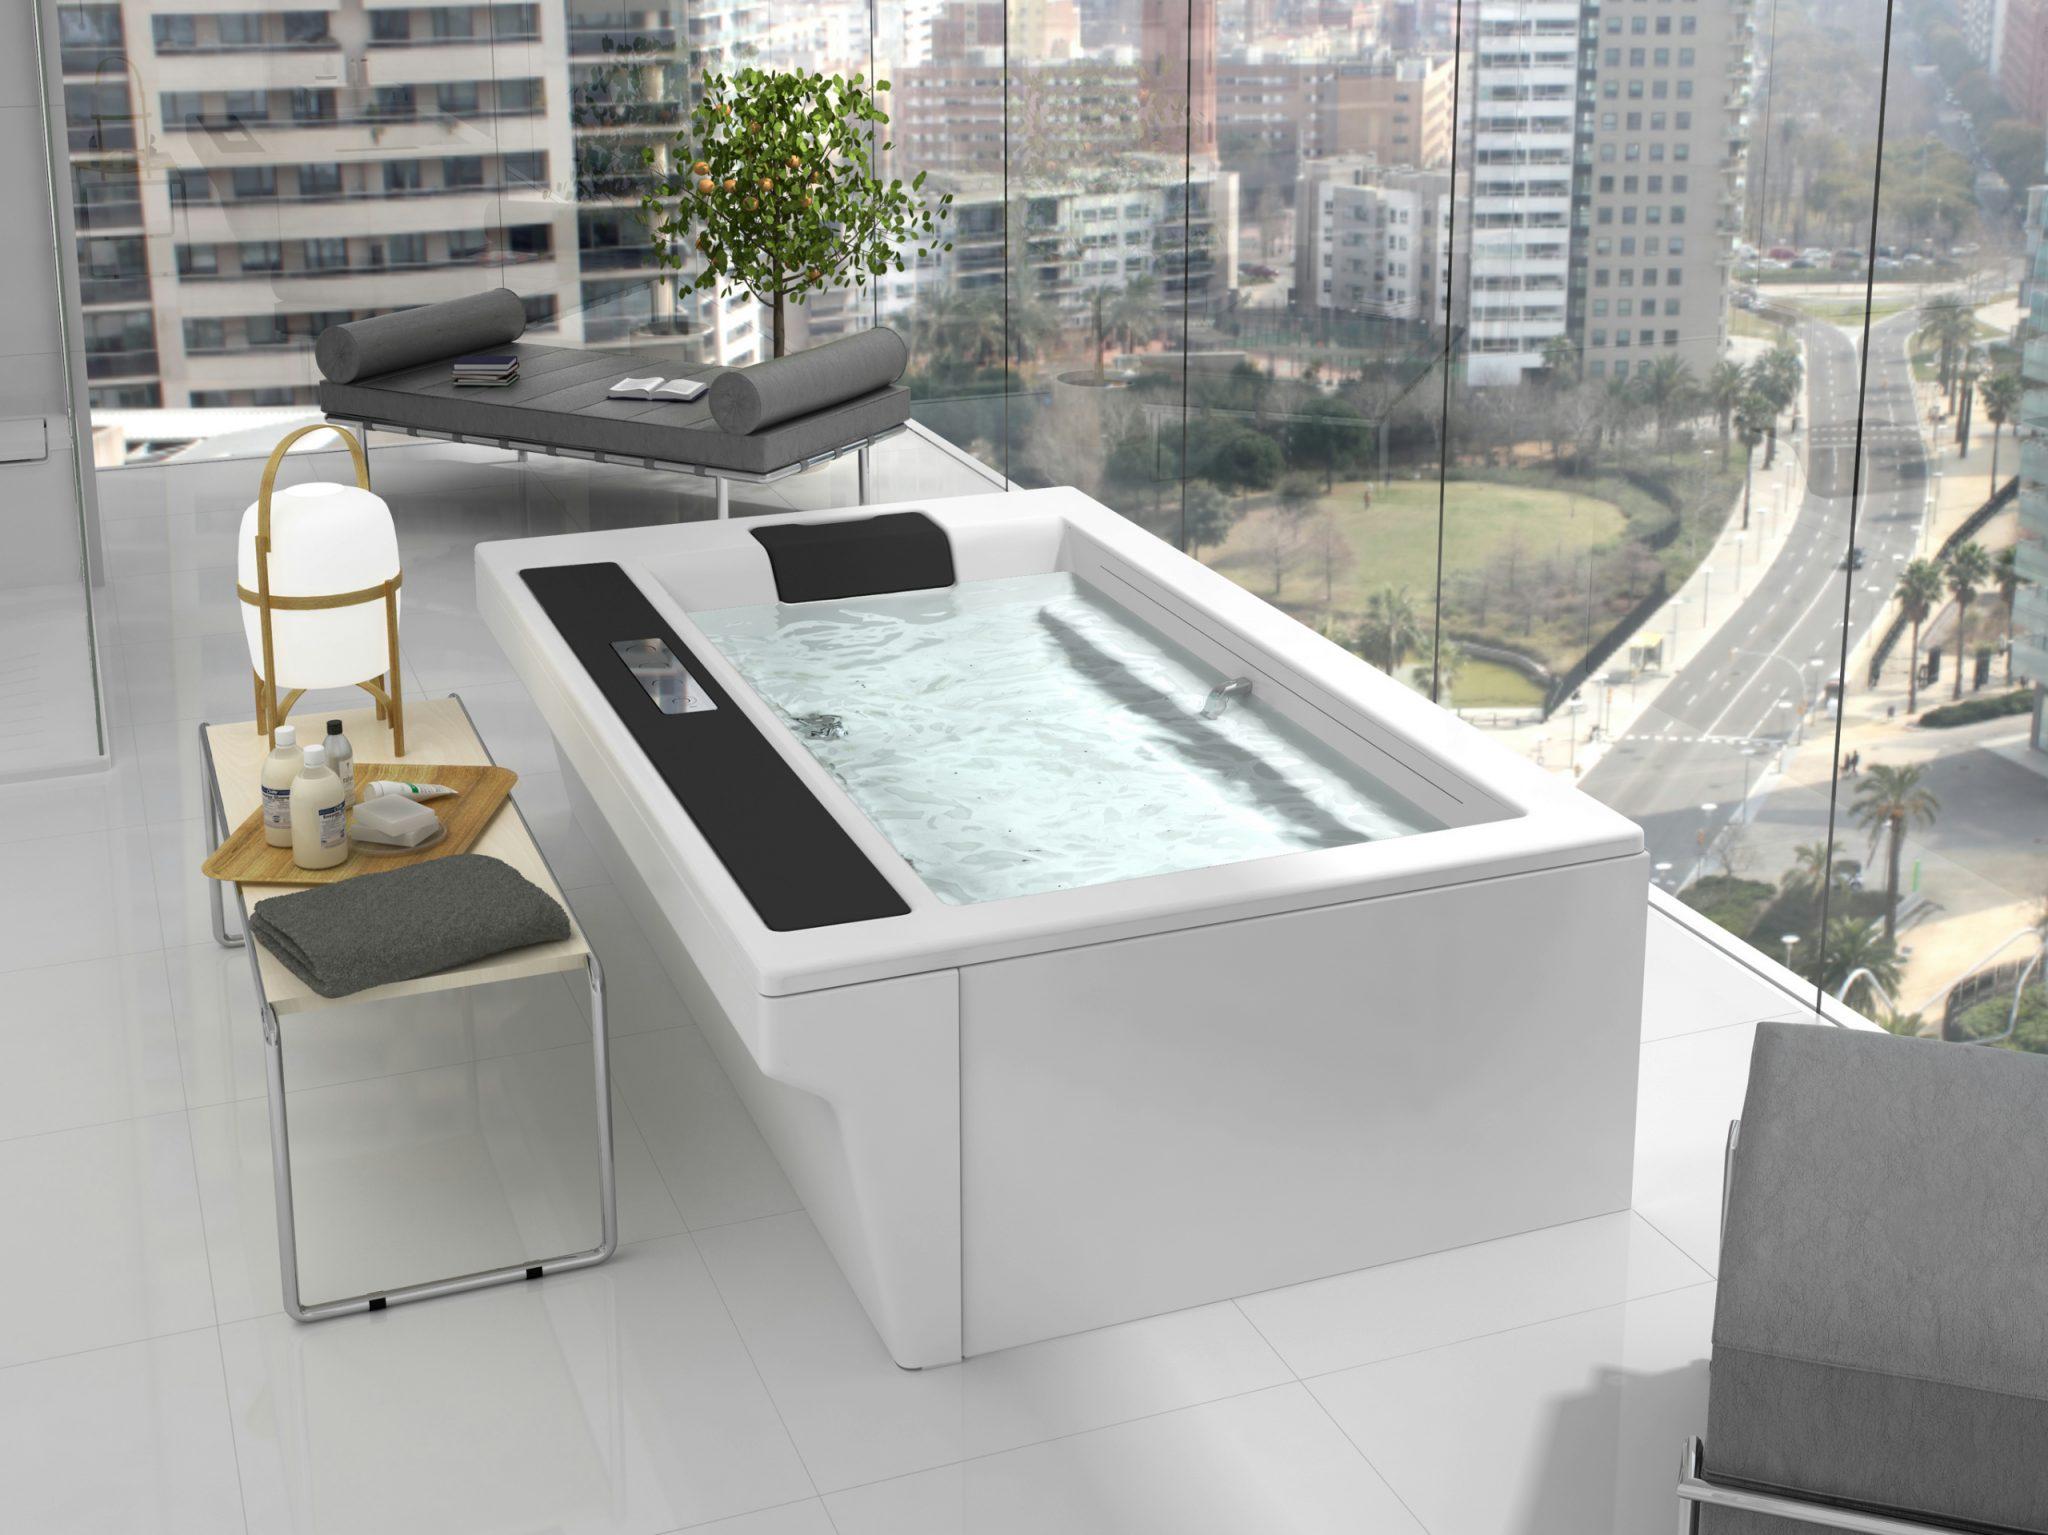 Vasca con seduta la comodit affascinante casina mia - Seduta vasca da bagno ...